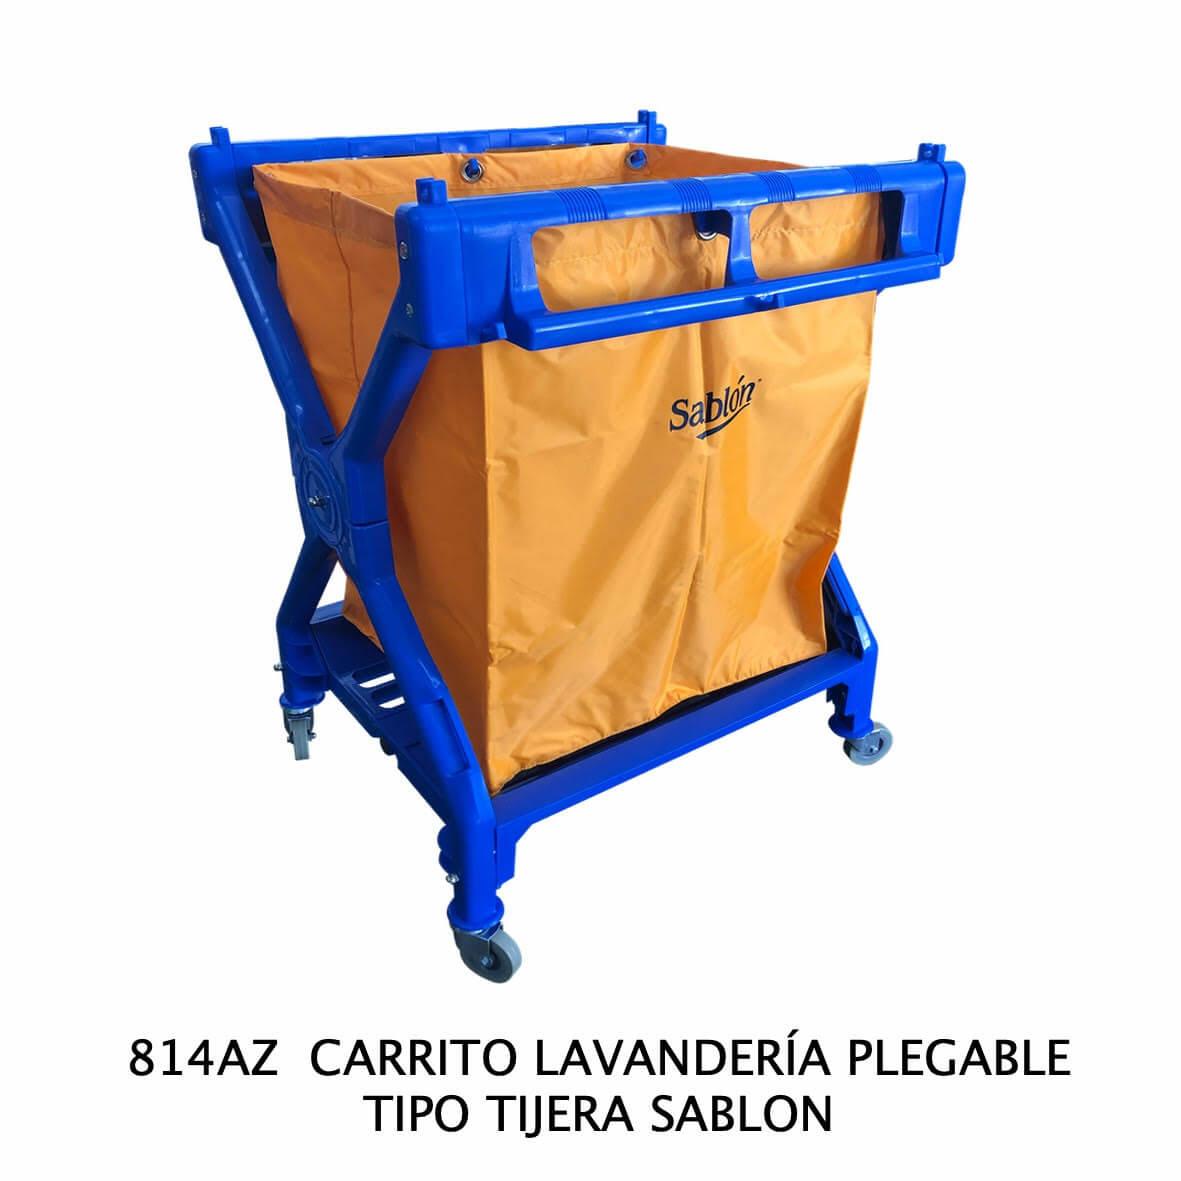 Carrito de lavandería plegable tipo tijera modelo 814 AZ Sablón